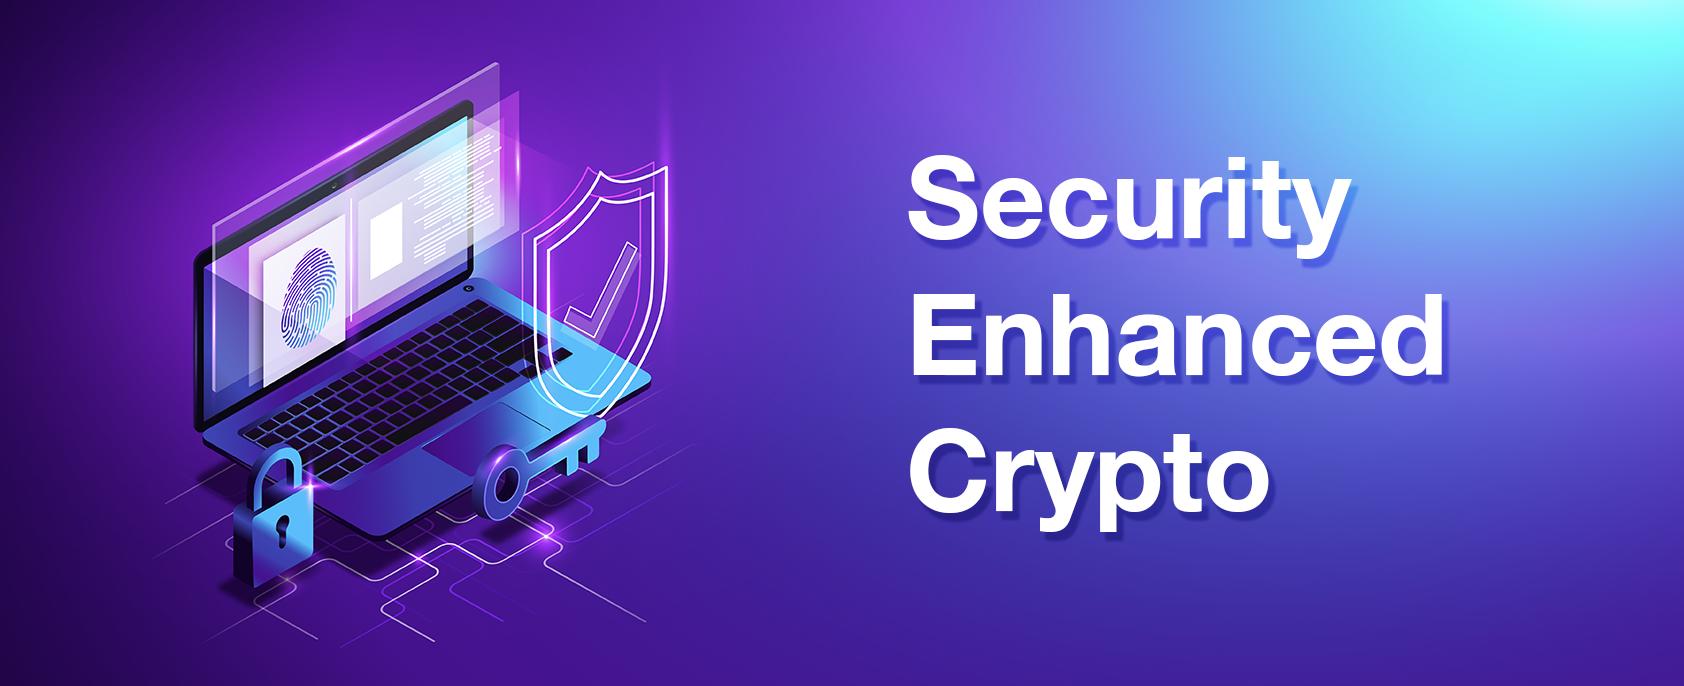 Security Enhanced Crypto